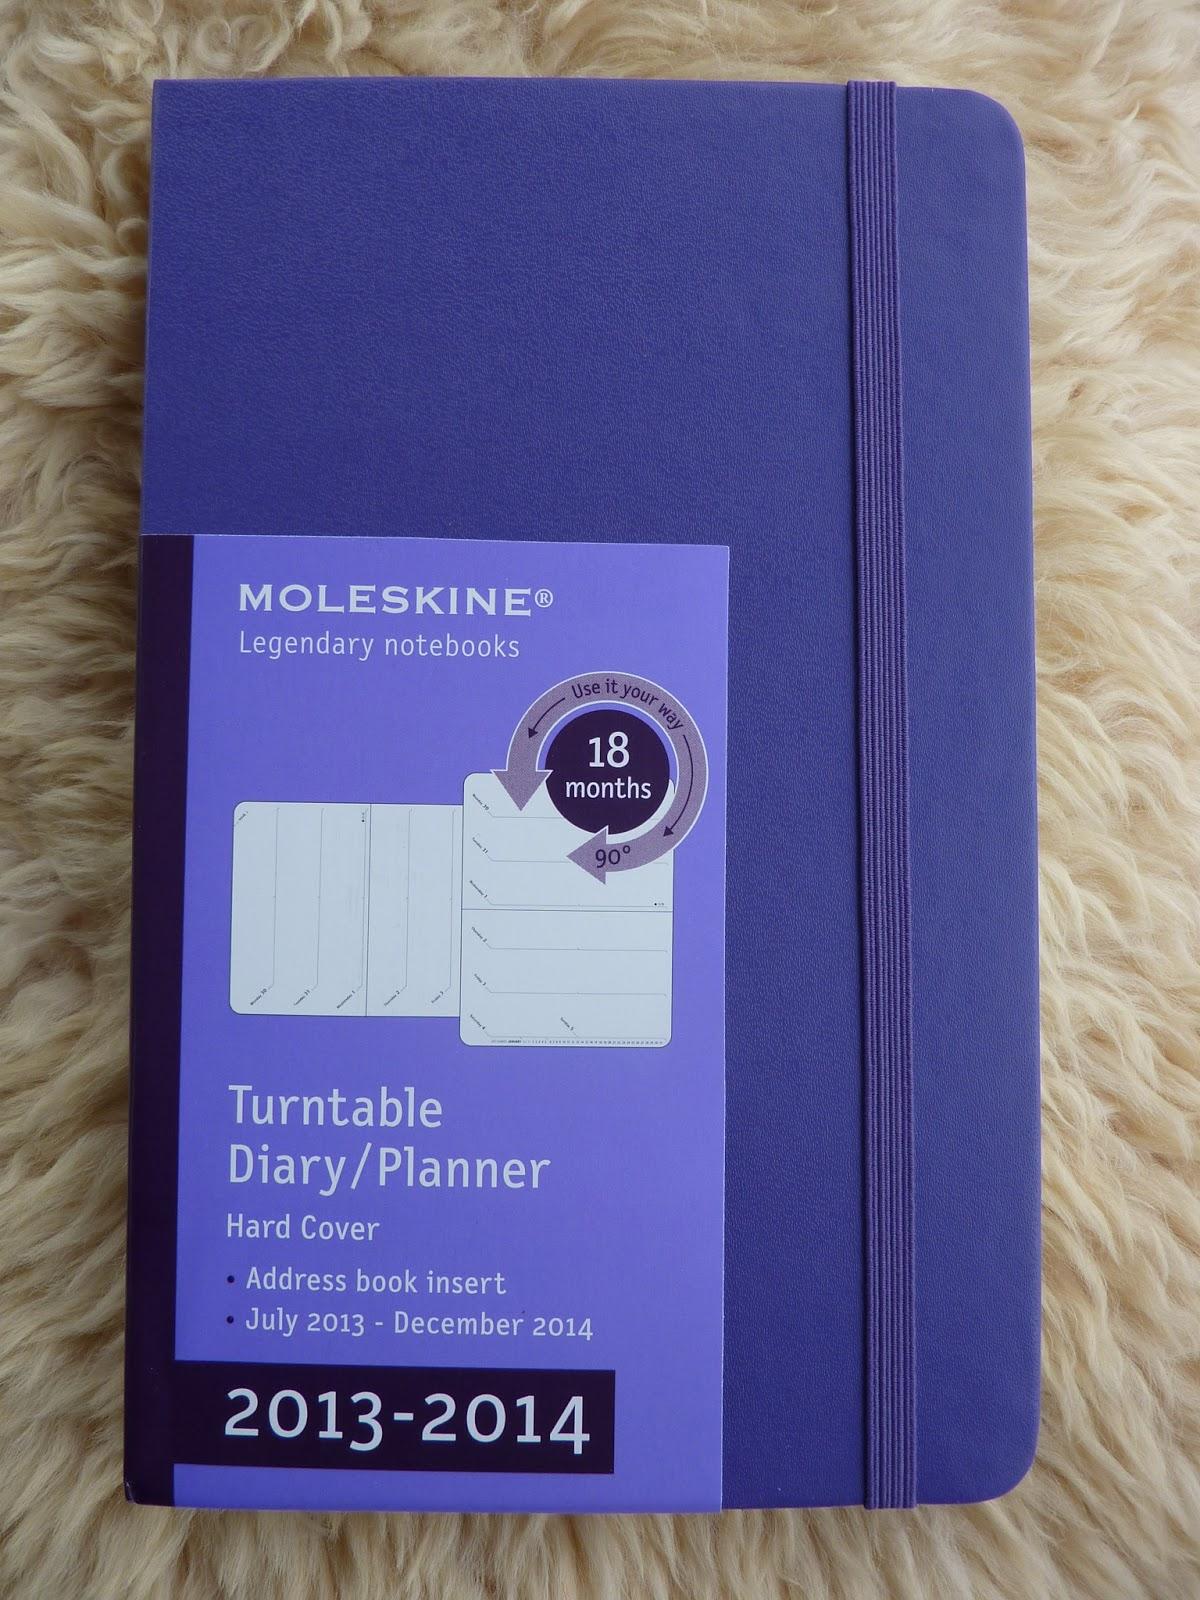 Moleskine Turntable 18 month planner